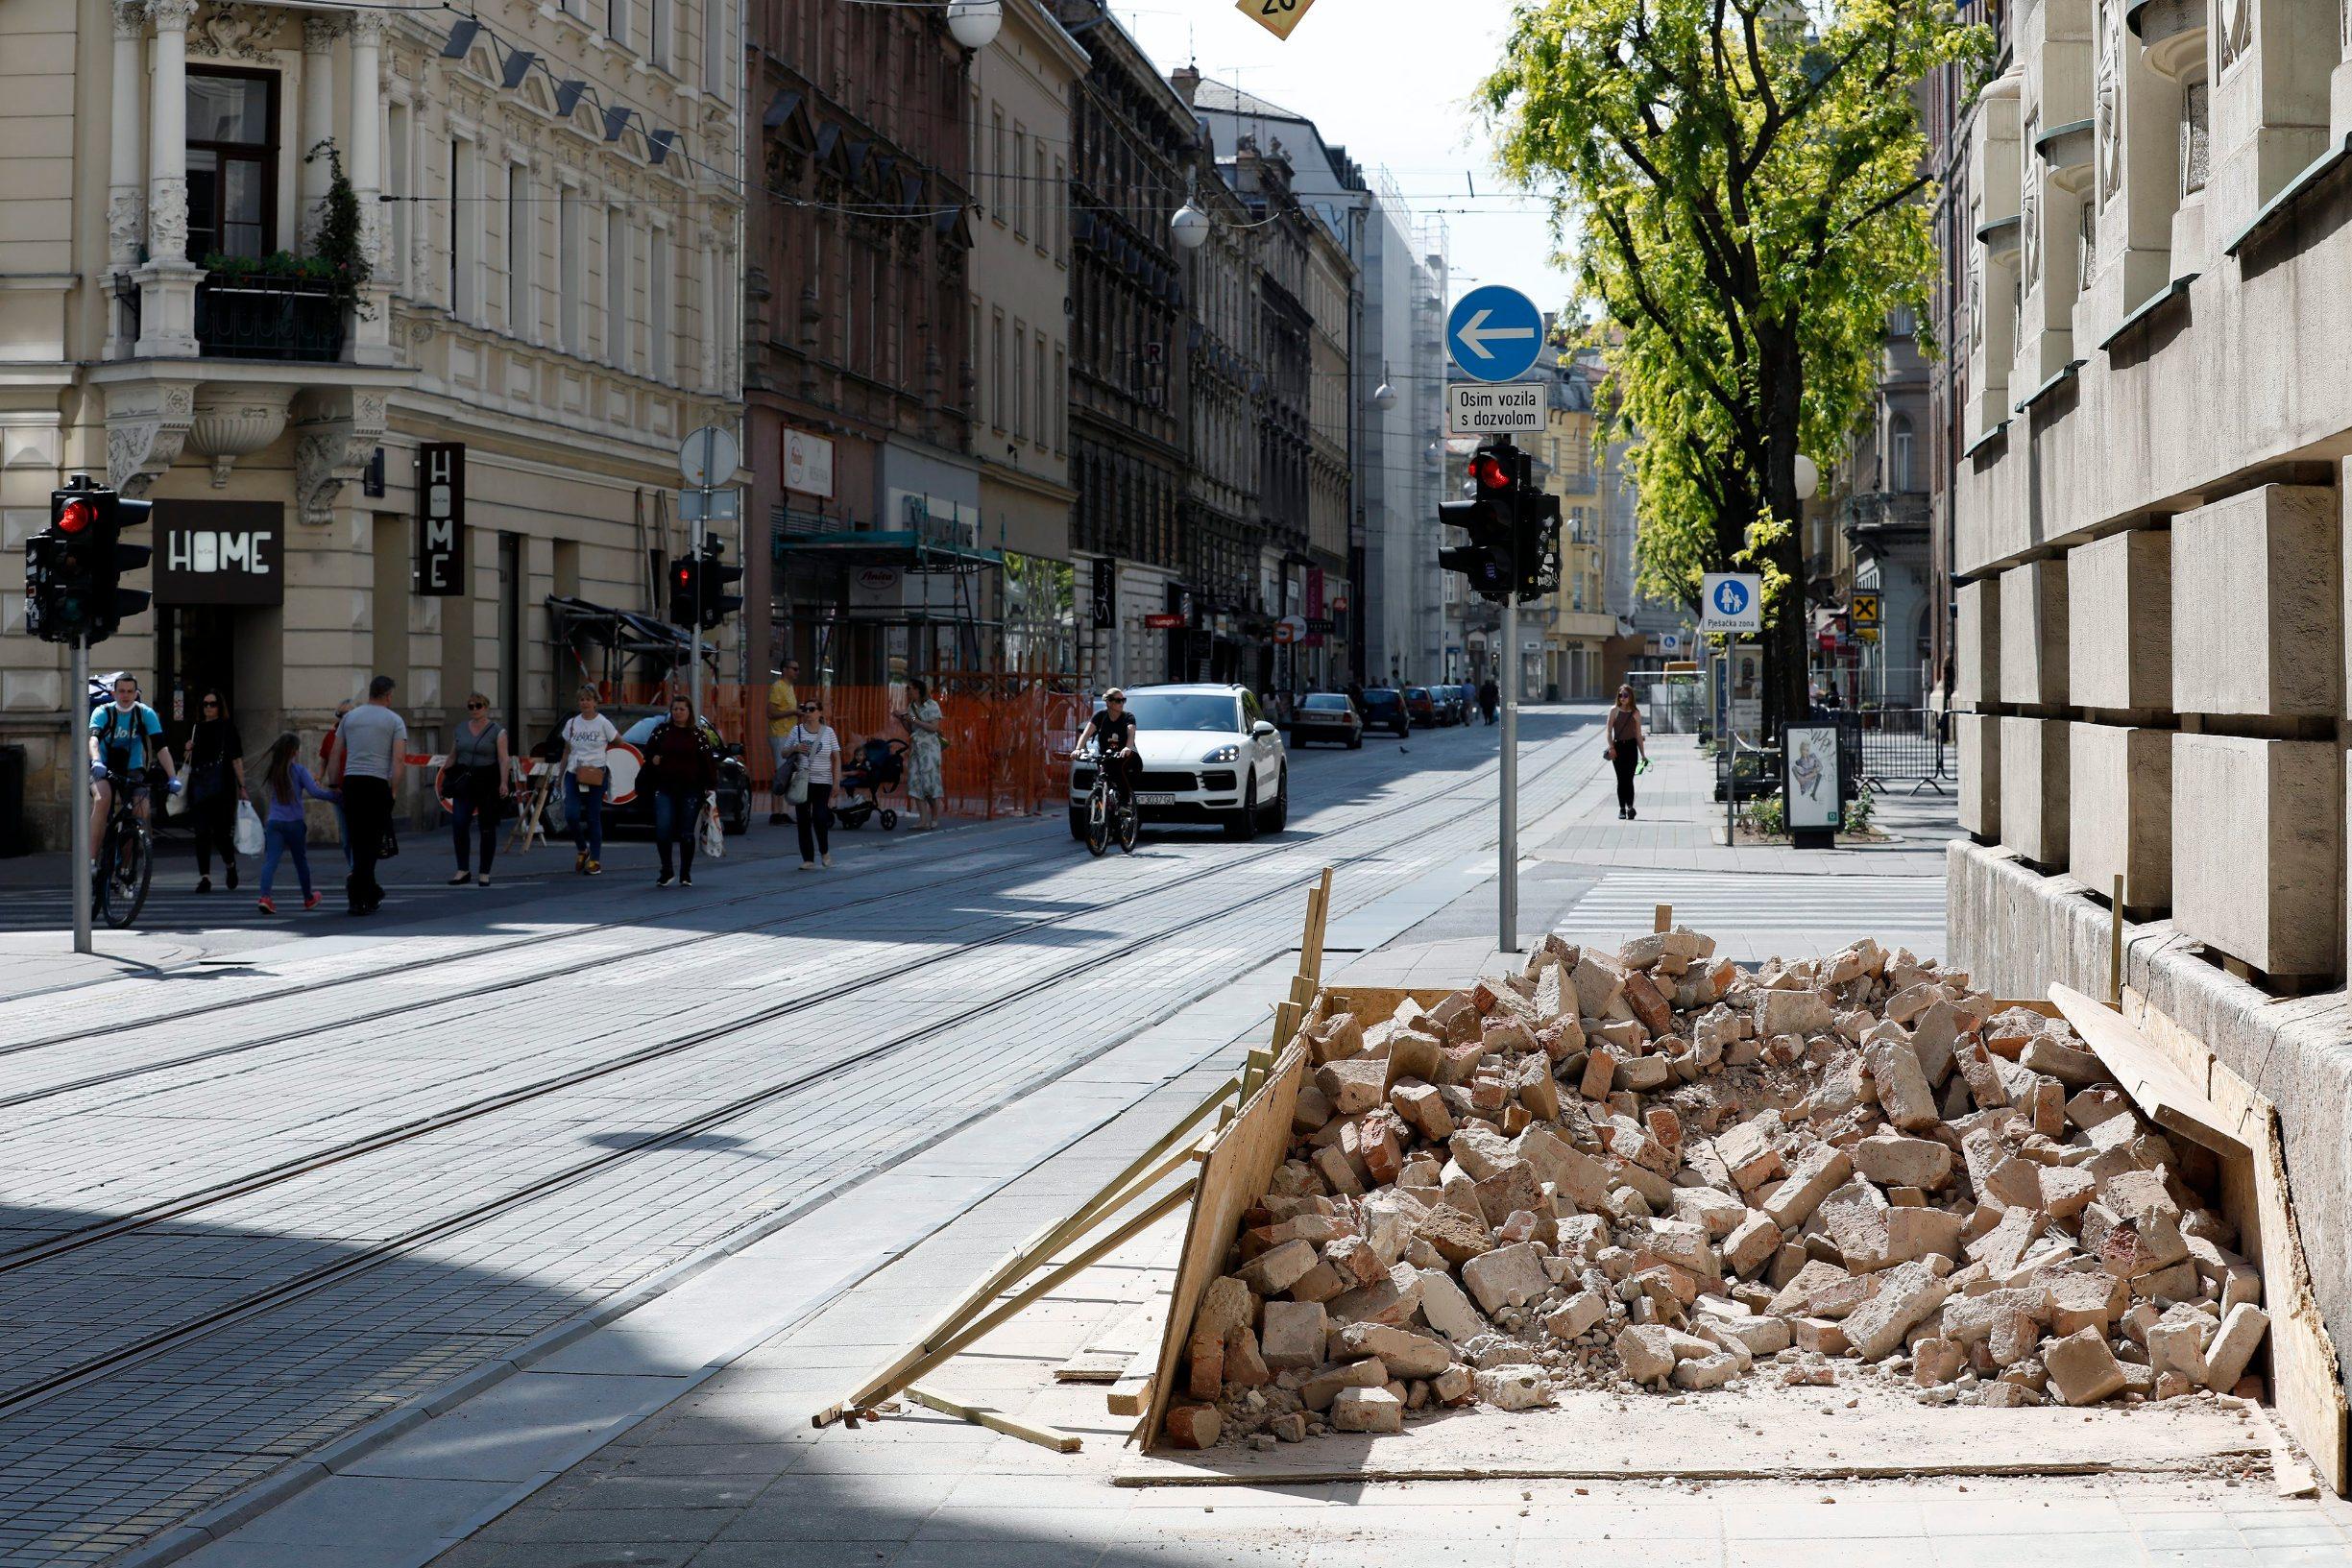 Zagreb, 090520. Grad 50 dana nakon potresa. Na fotografiji: stare cigle na nogostupu. Foto: Tomislav Kristo / CROPIX